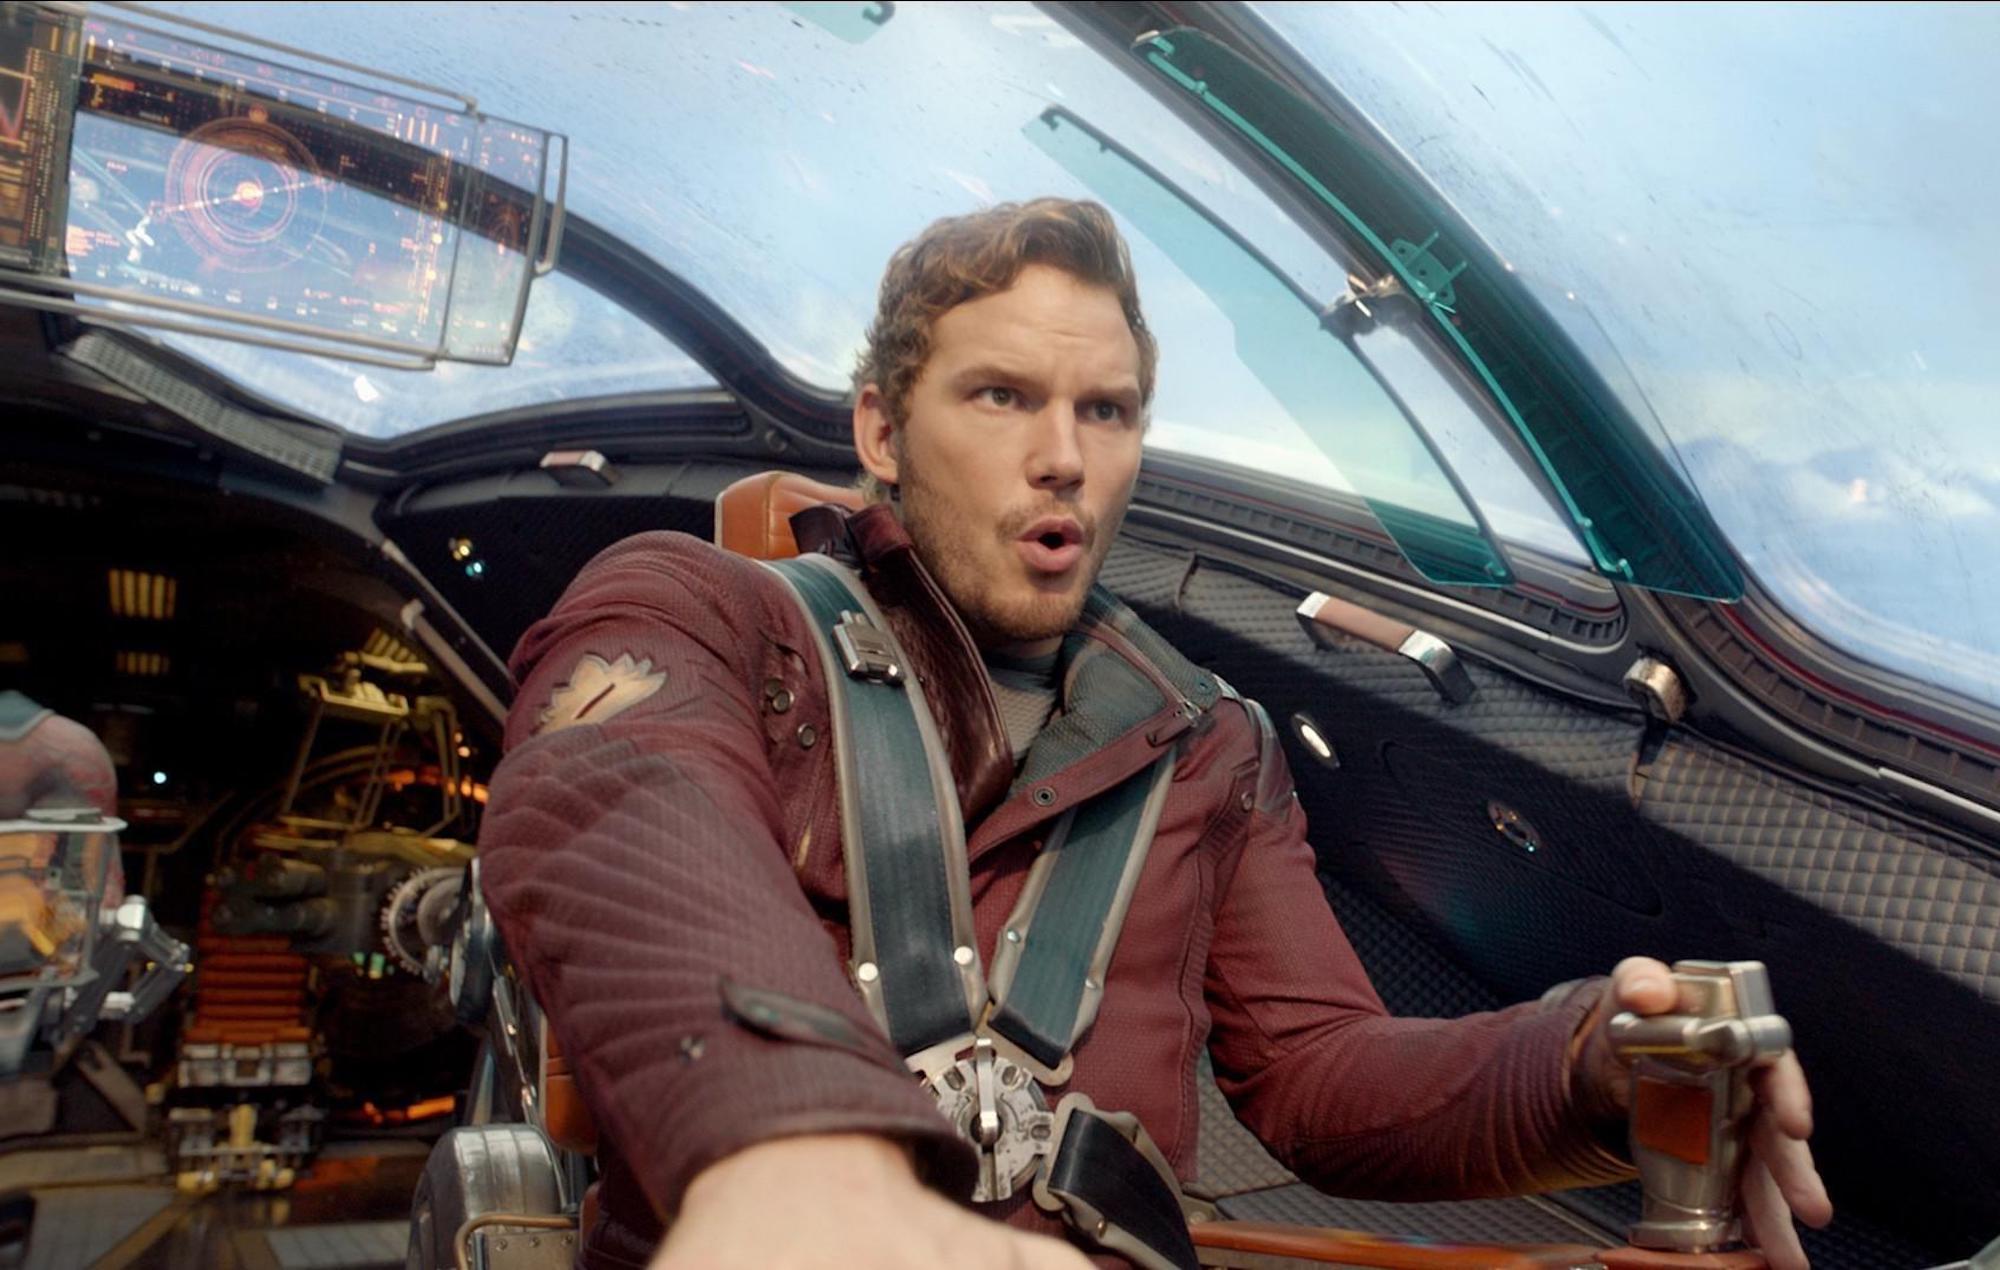 Marvel - Chris Pratt, Guardians Of The Galaxy